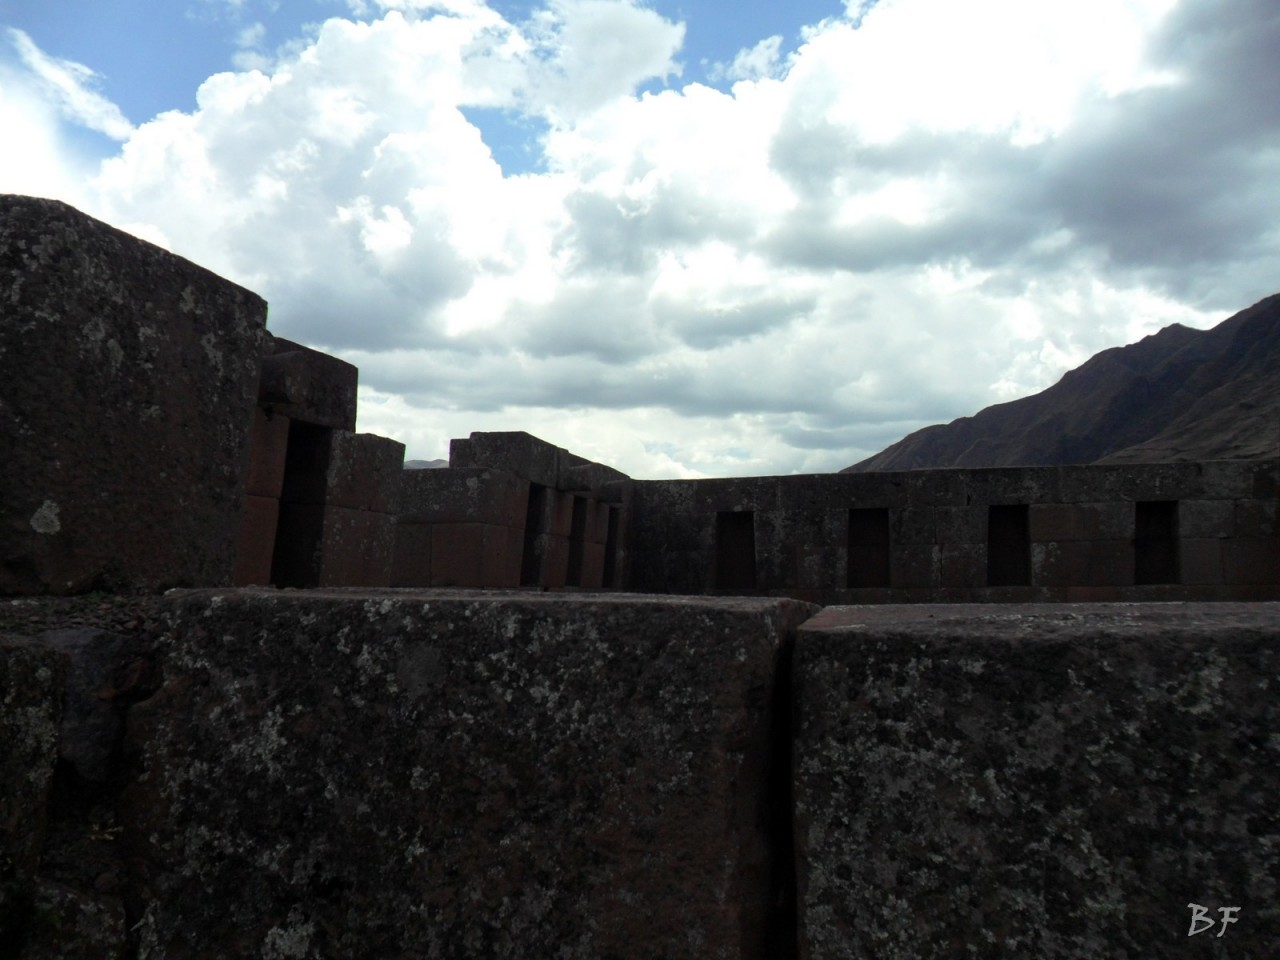 Mura-Poligonali-Megaliti-Altari-Rupestri-Pisac-Cusco-Perù-45